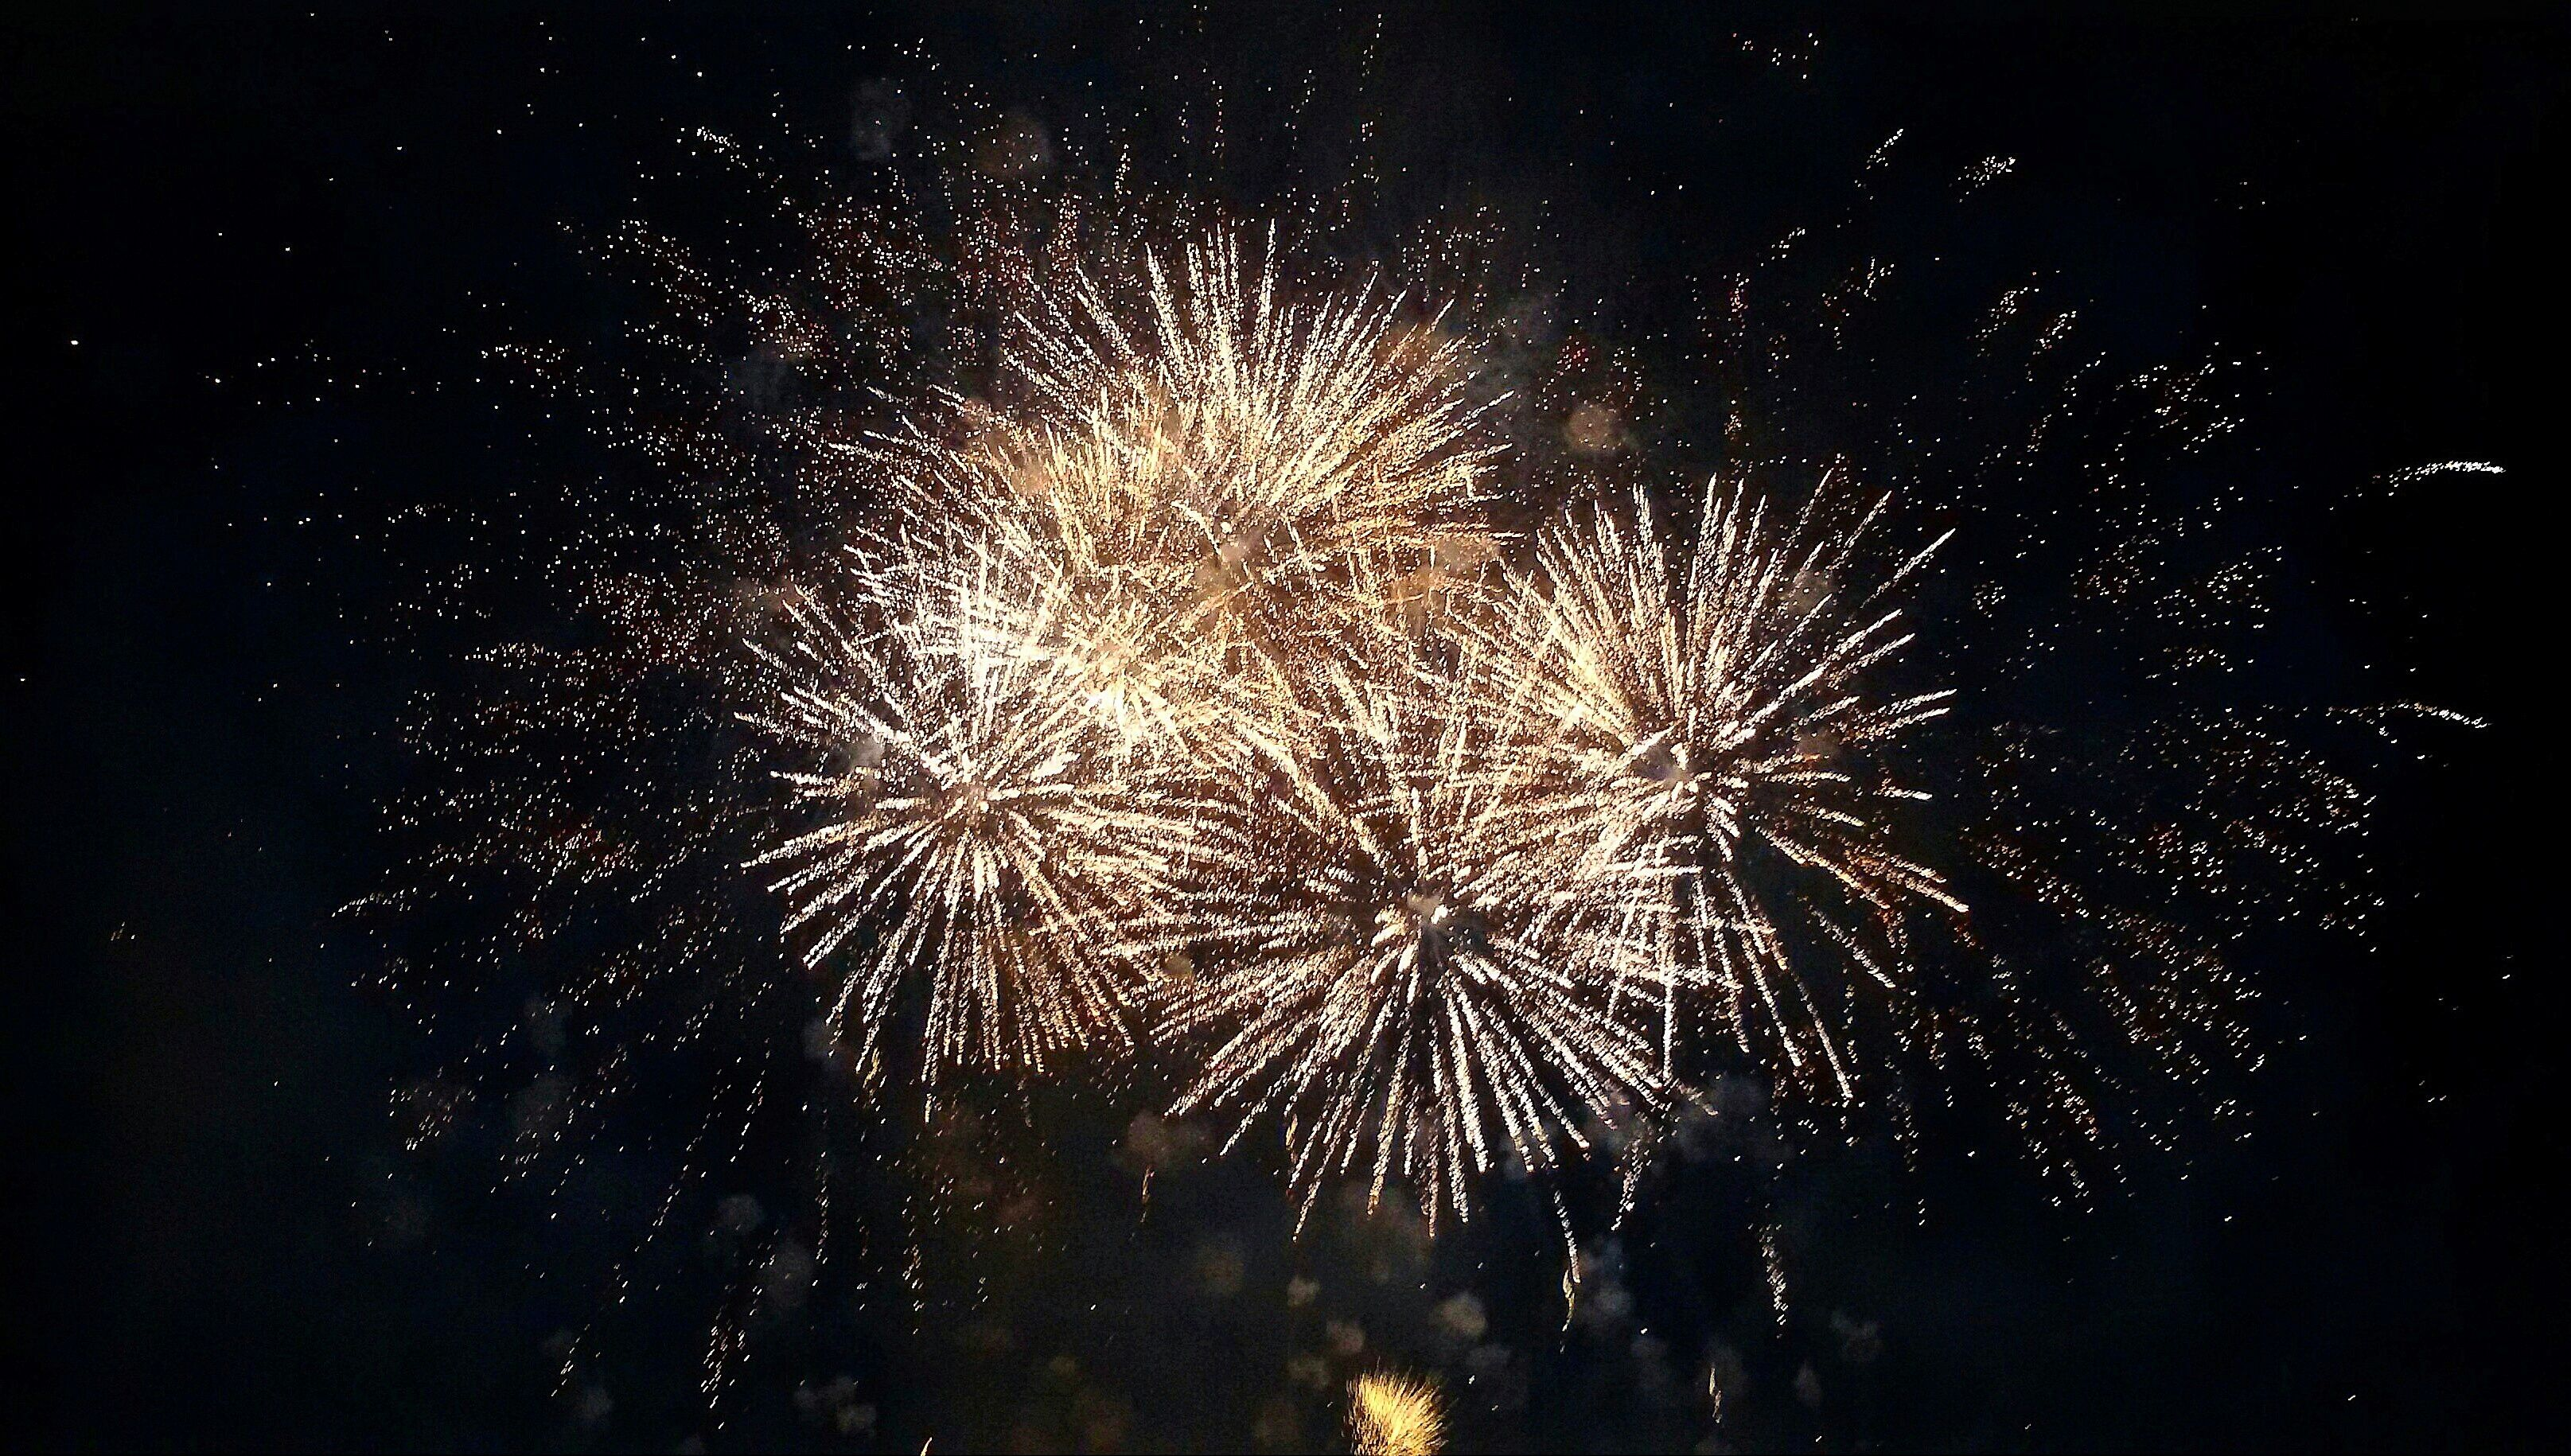 Oklahoma City's Bricktown Fireworks and Fourth Fest